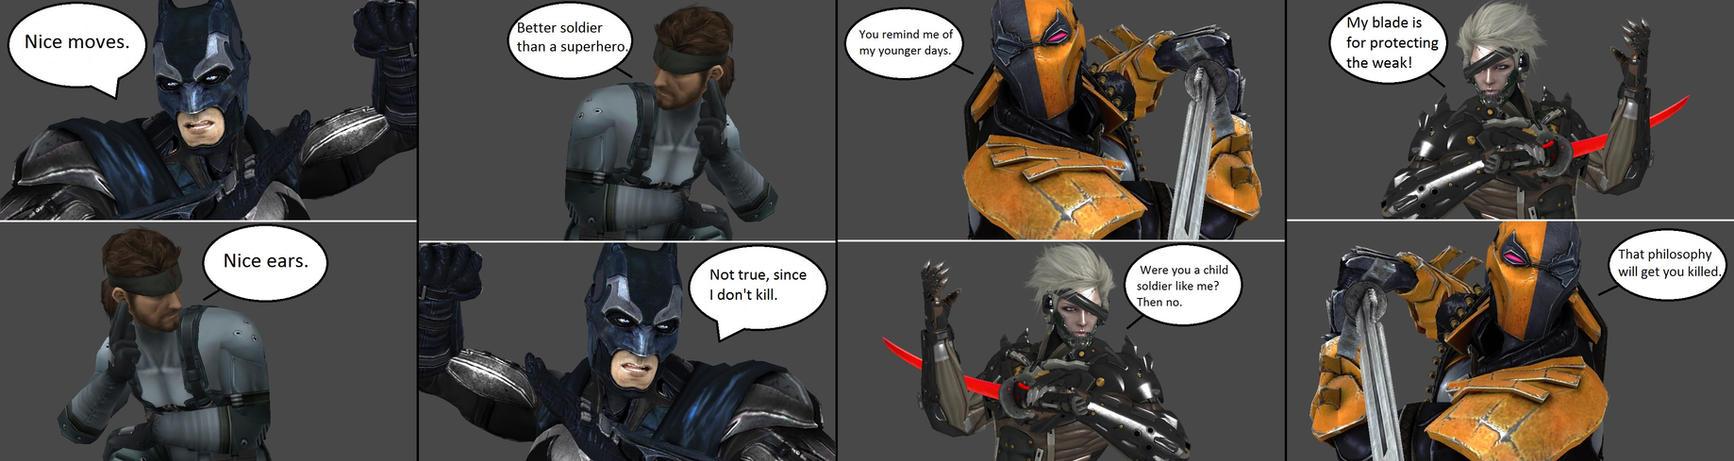 Injustice Batman Vs Snake Deathstroke Vs Raiden By XXTrettaXx On